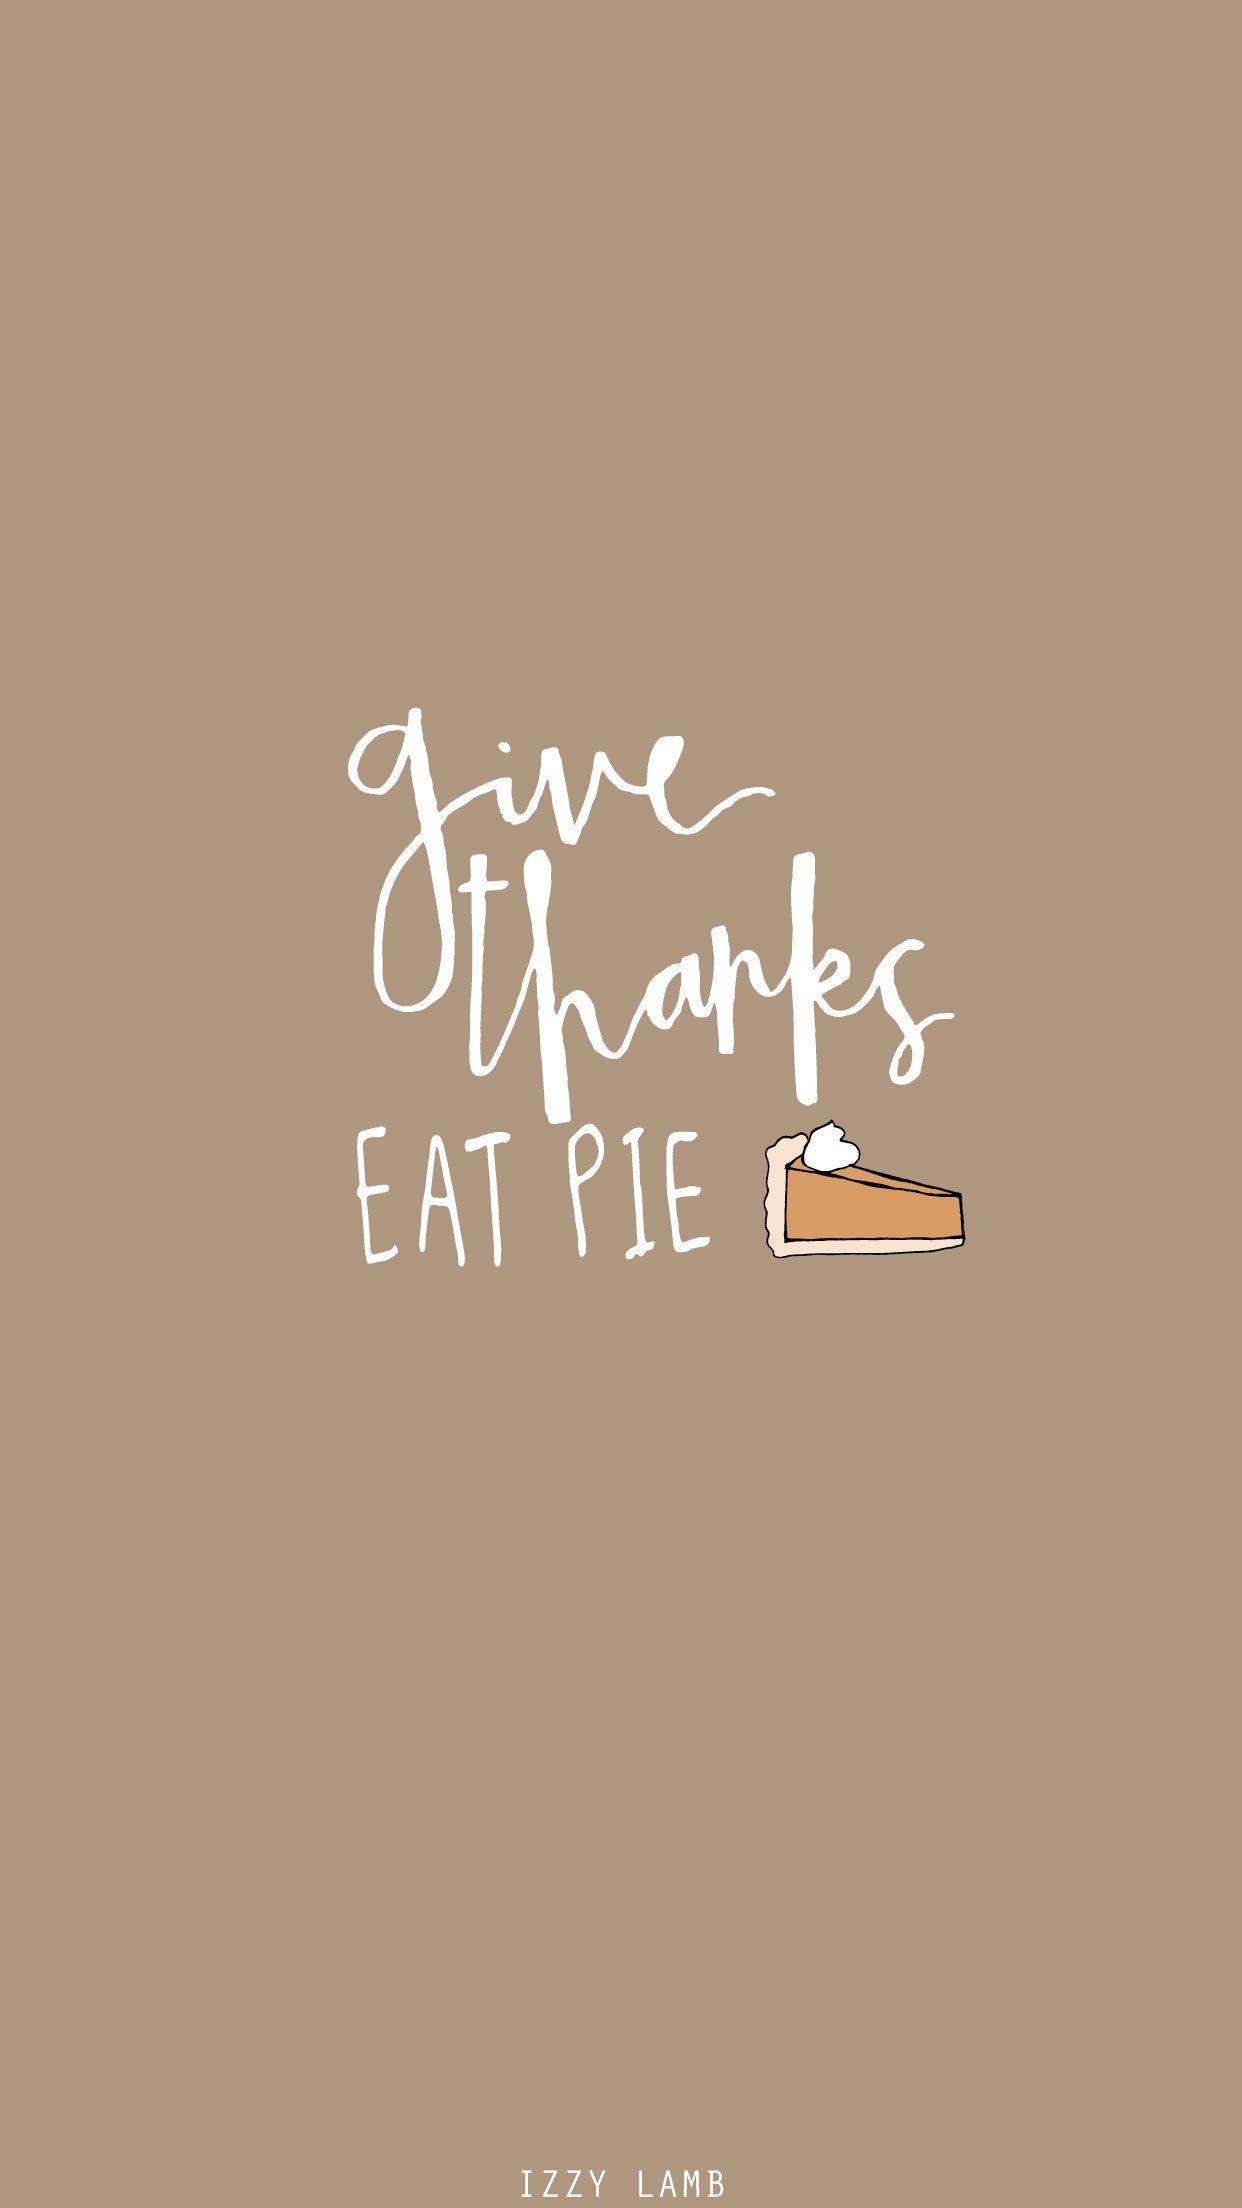 Give Thanks Eat Pie November Wallpaper Fall Wallpaper Thanksgiving Wallpaper